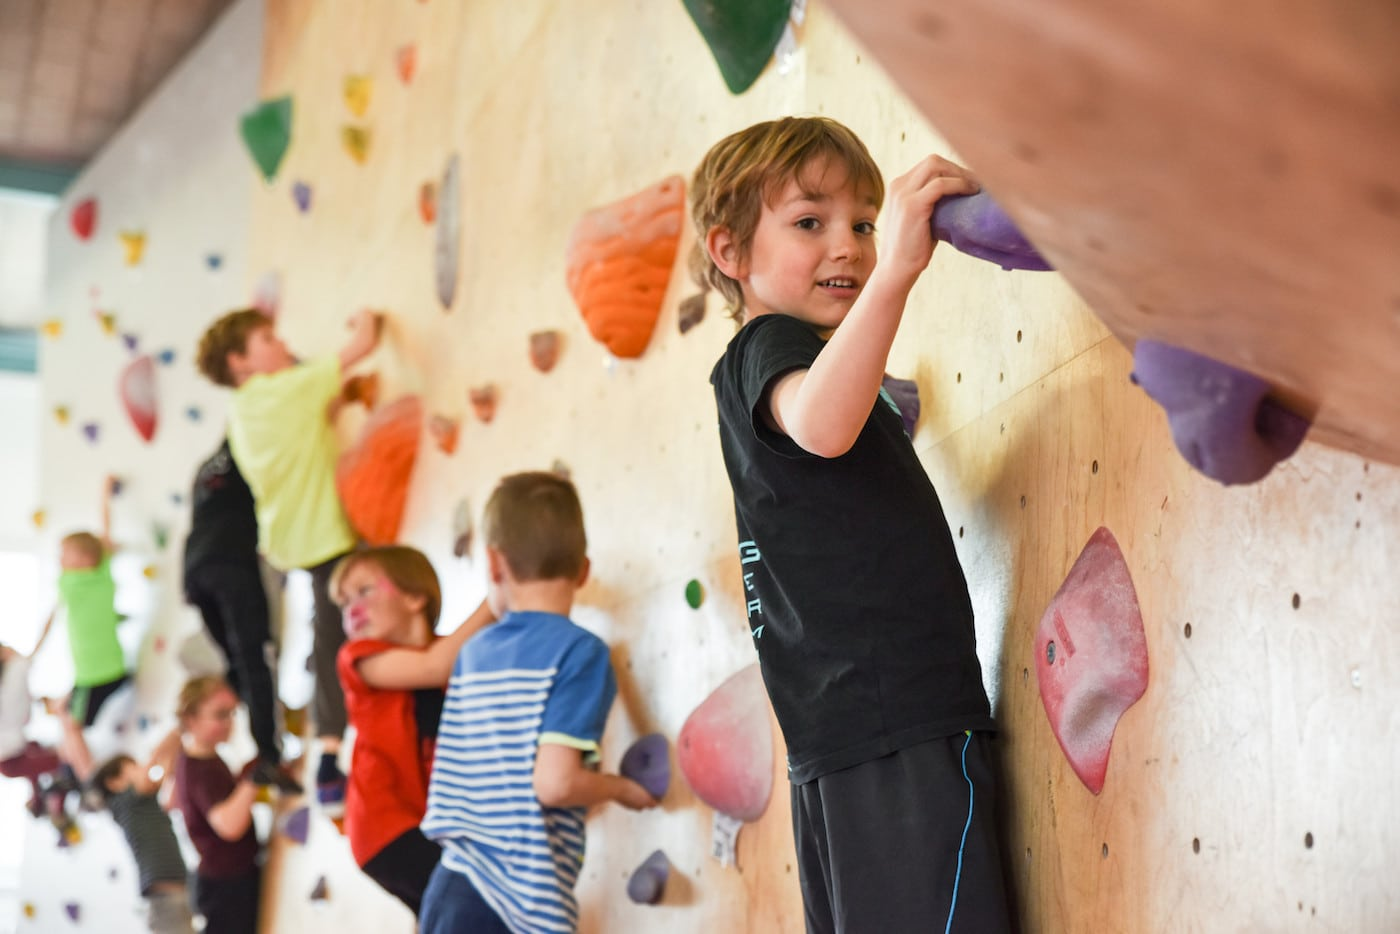 Indoor-Kletterhallen- und Boulderhallen für Familien mit Kindern in Berlin // HIMBEER